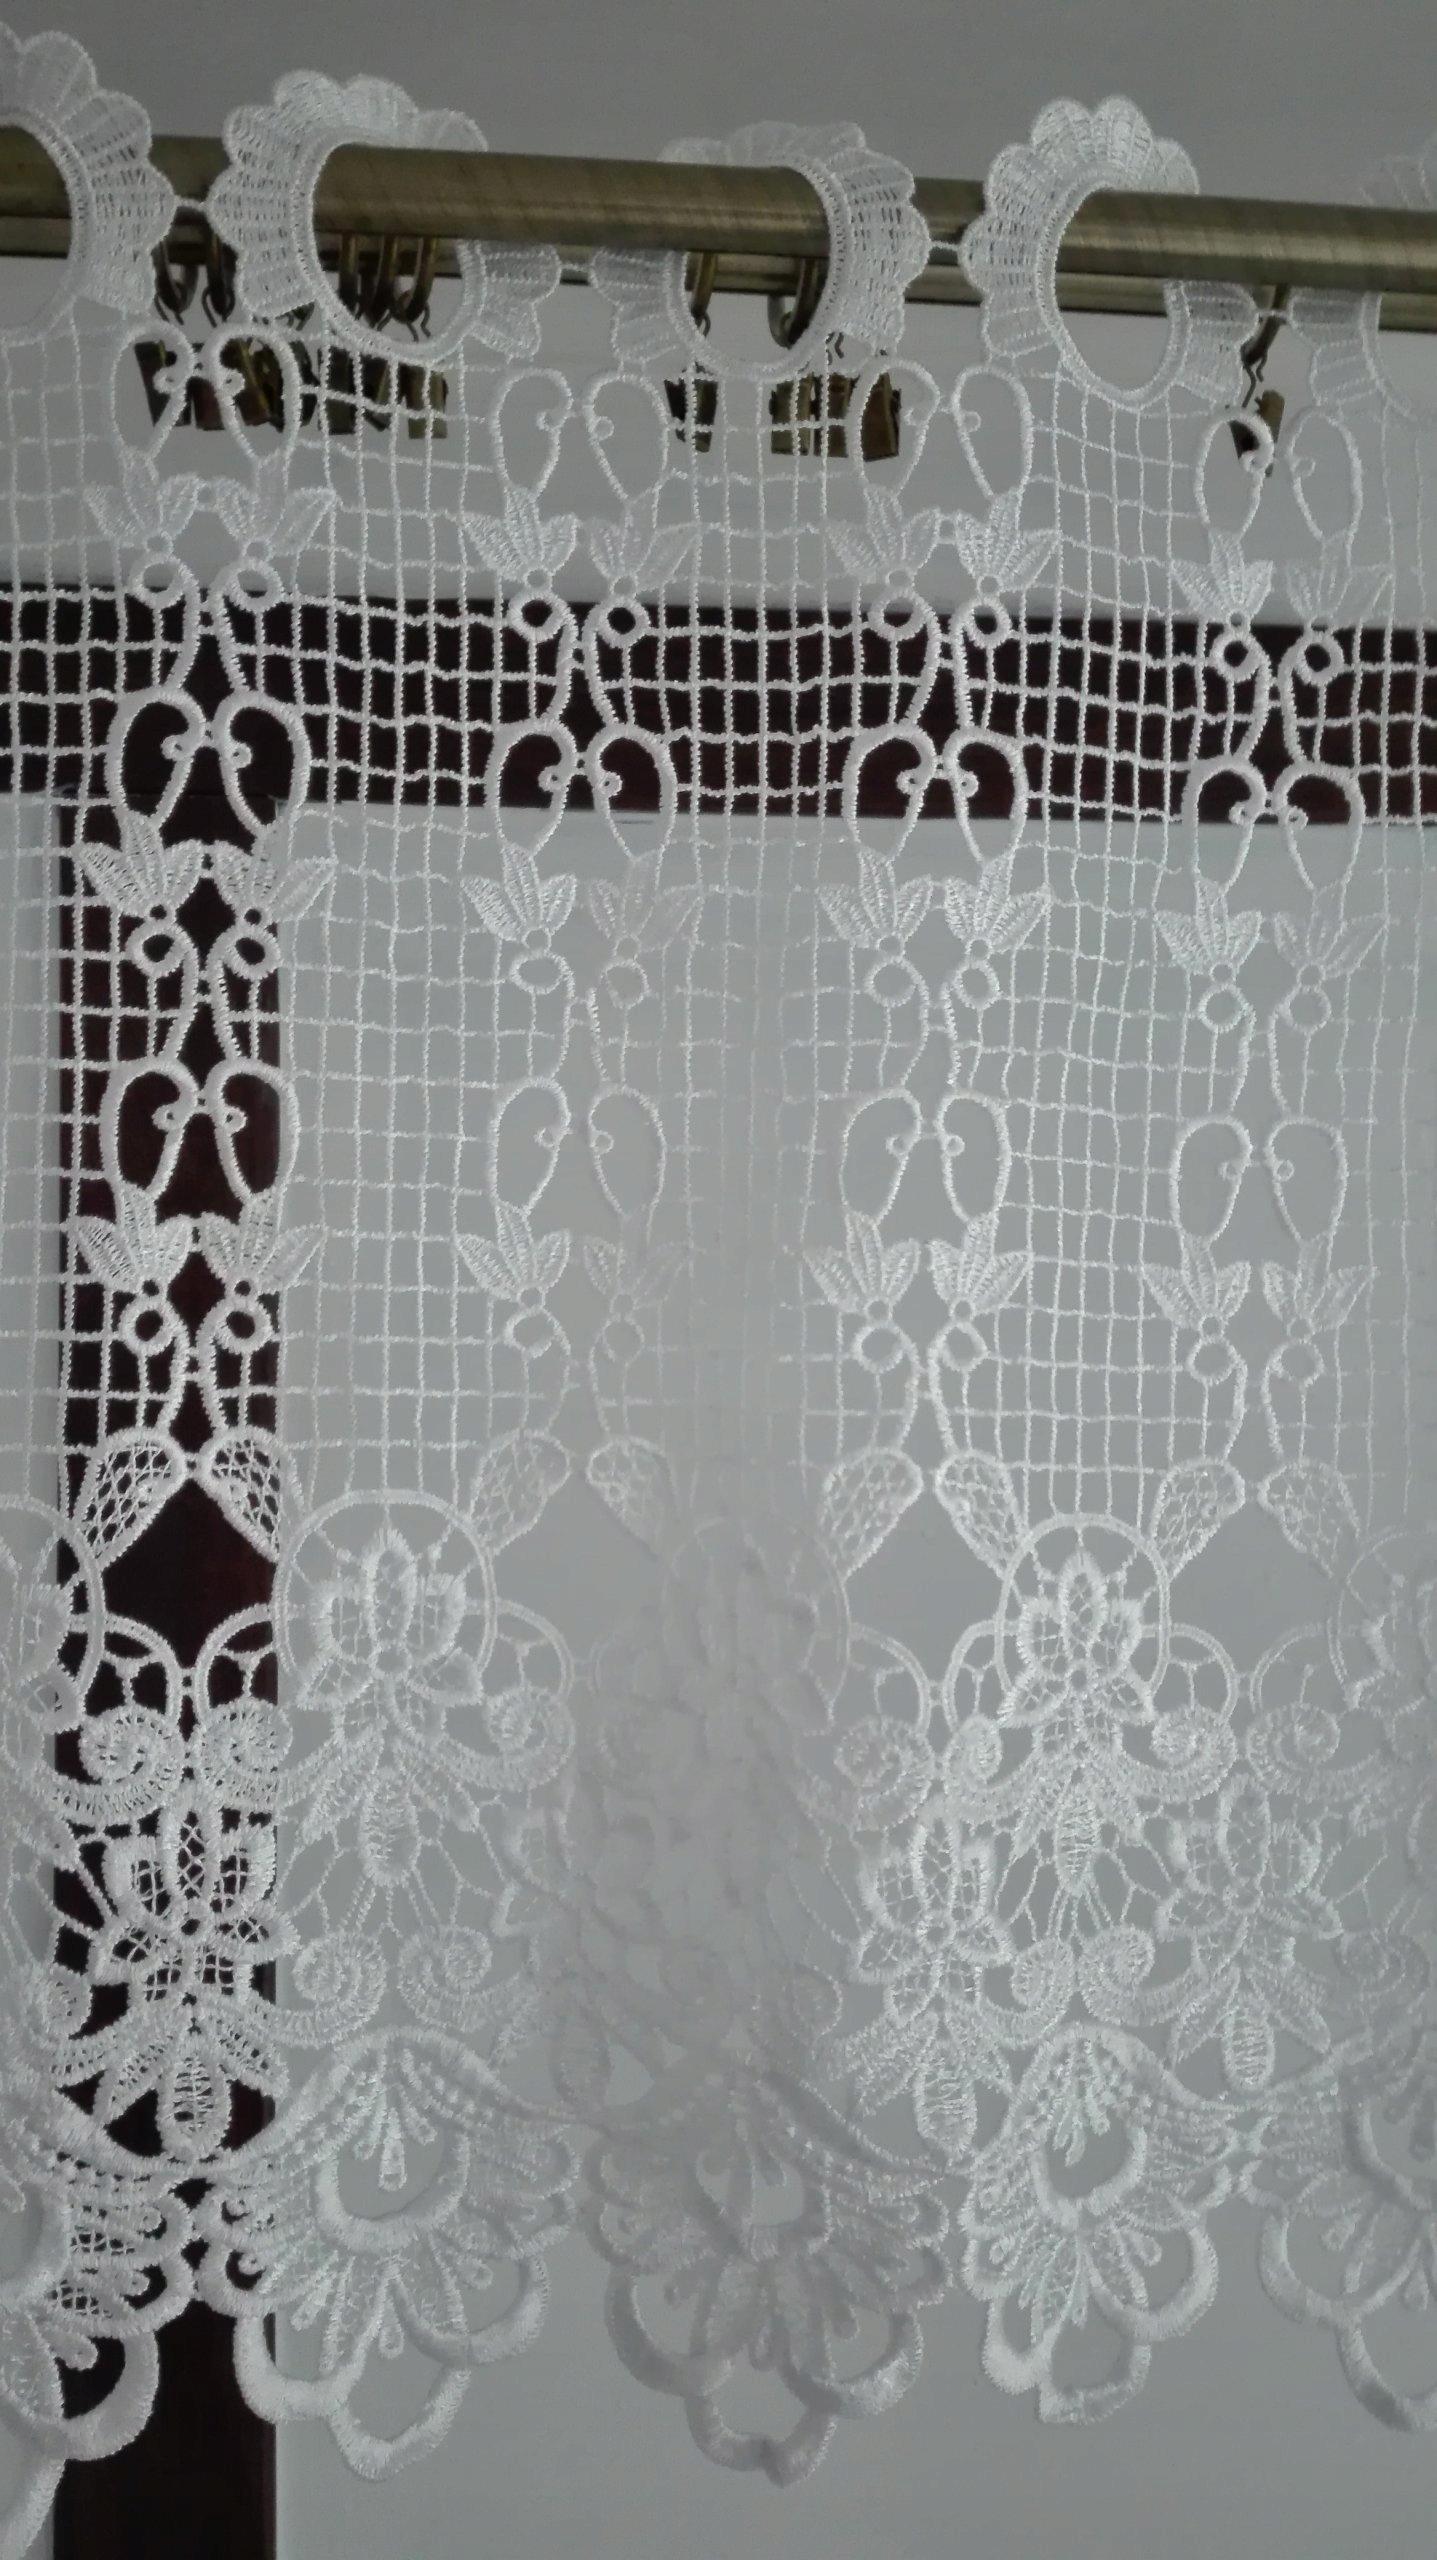 16abfbae65 zazdroska gipiura haft francuski biała 50cm - 7402378498 - oficjalne ...